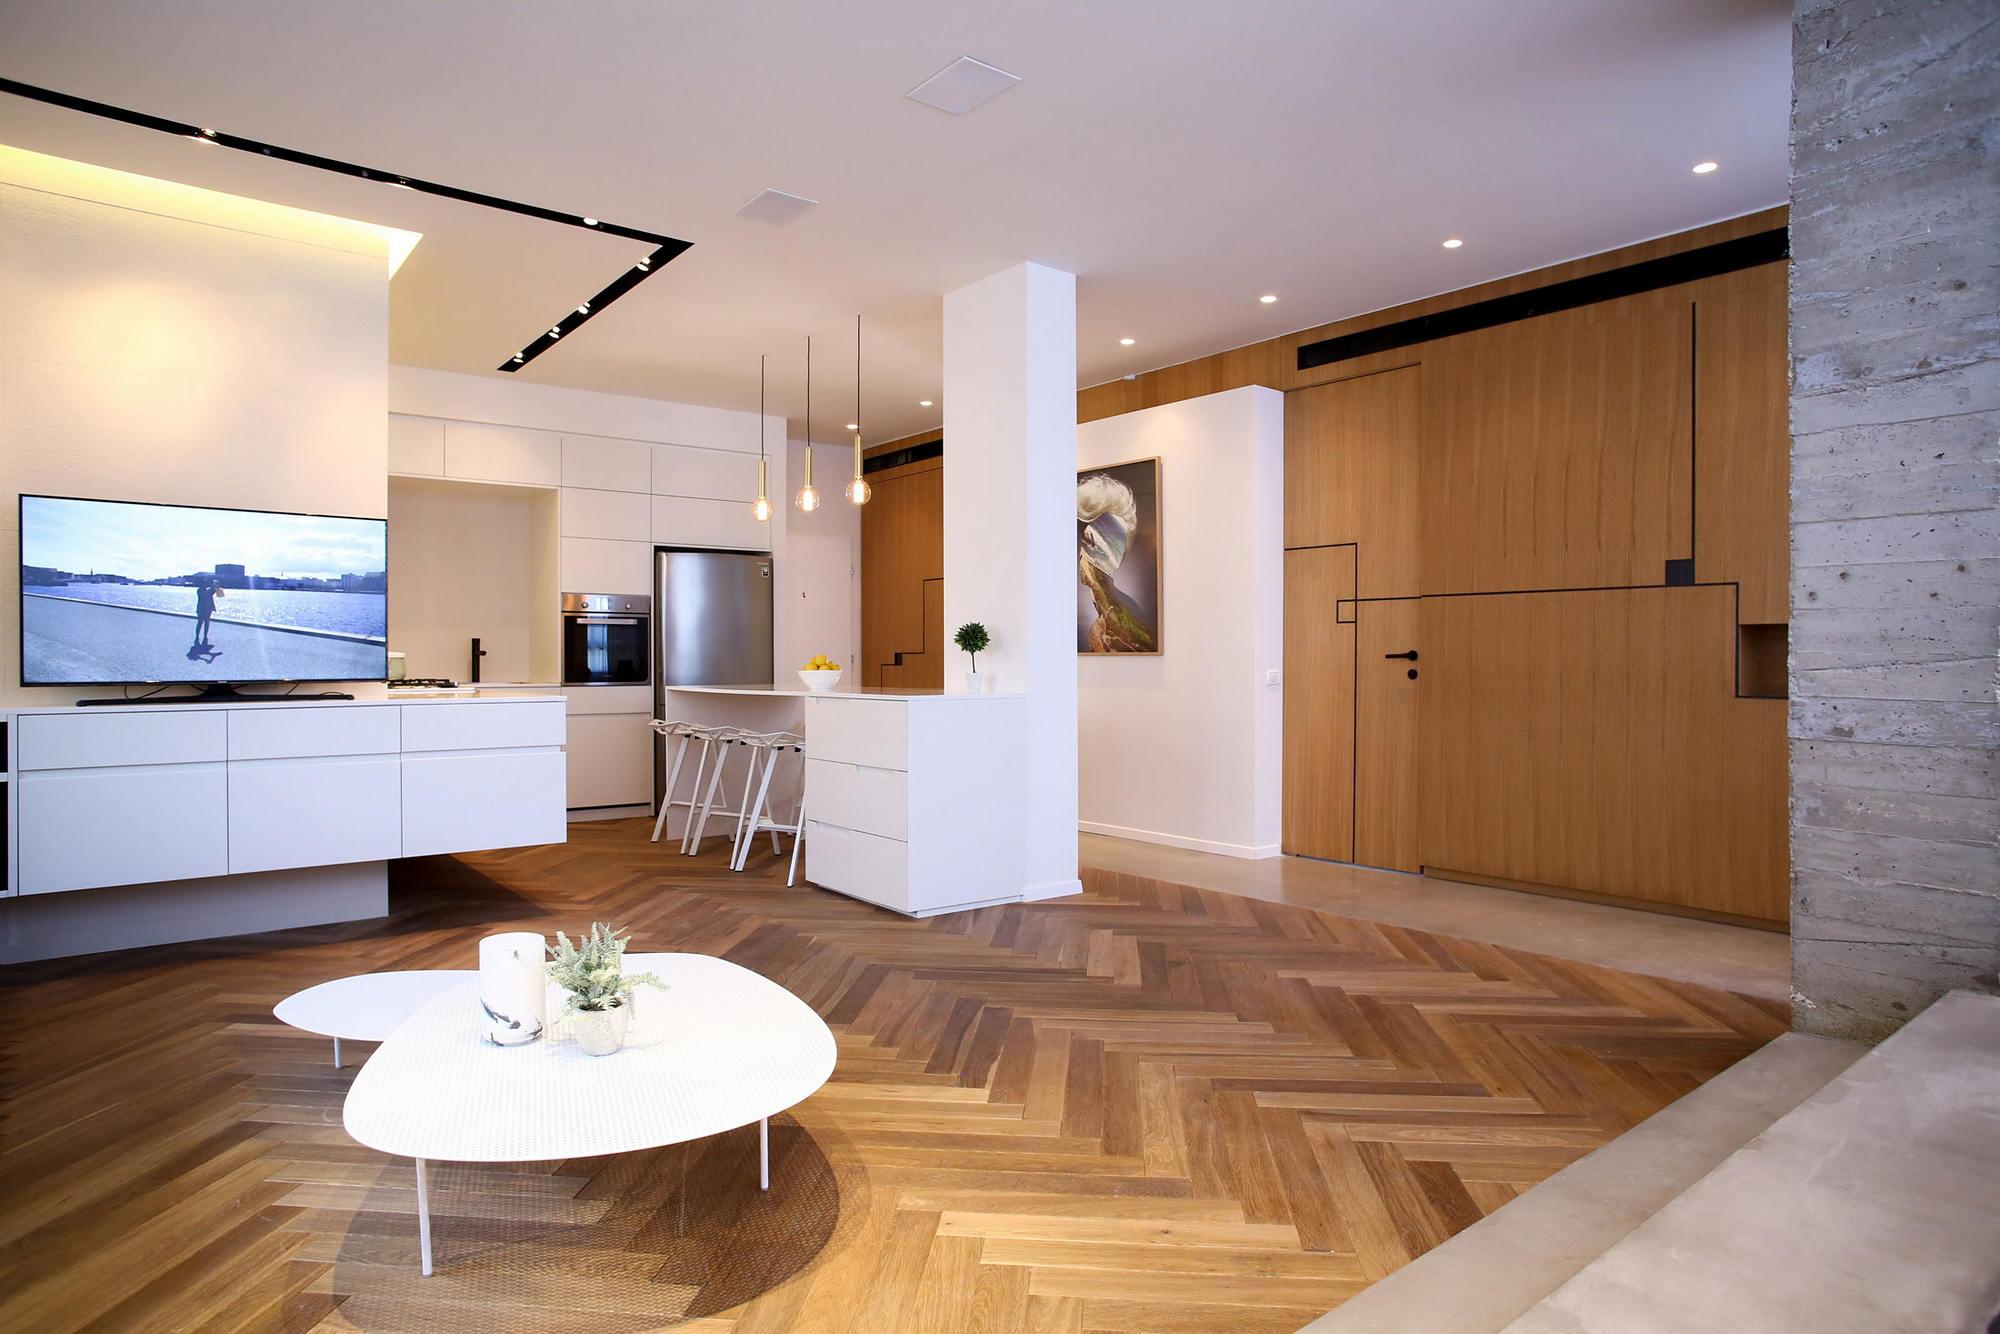 Tlv Gordon 8.2: The Apartment In Tel Aviv